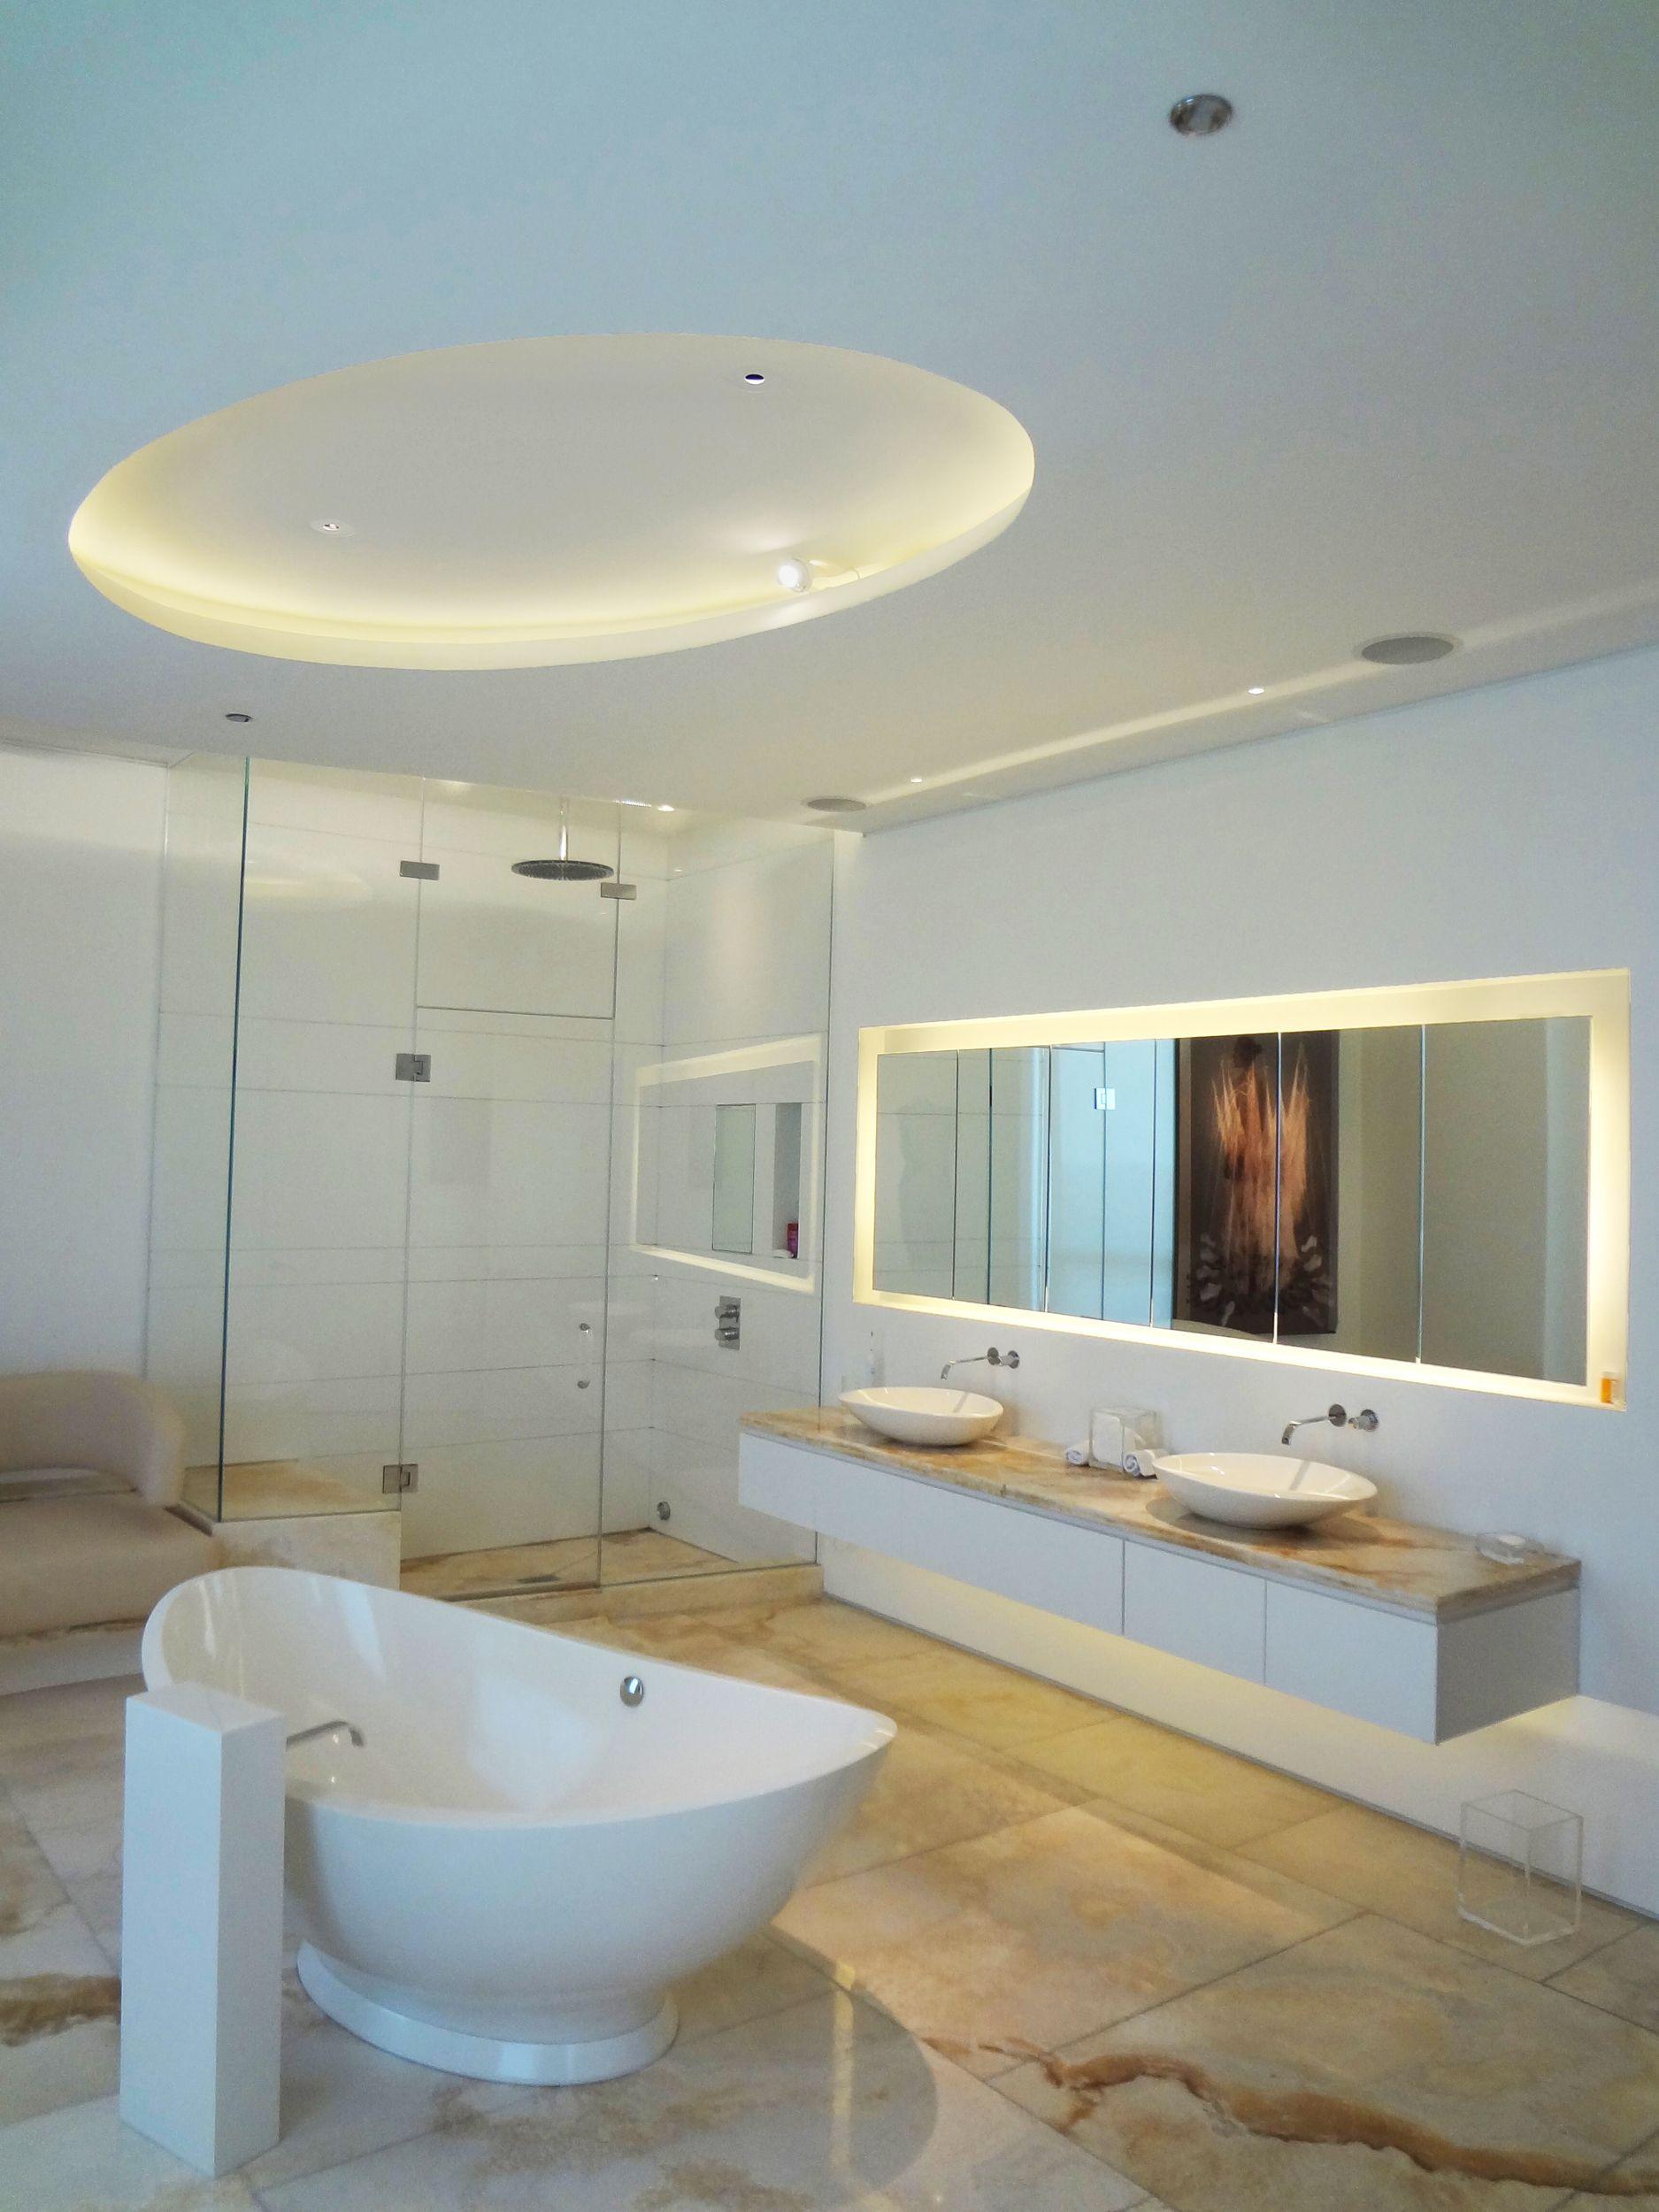 Lighting Three Types Of Bathroom Lighting Fixtures Bathroom